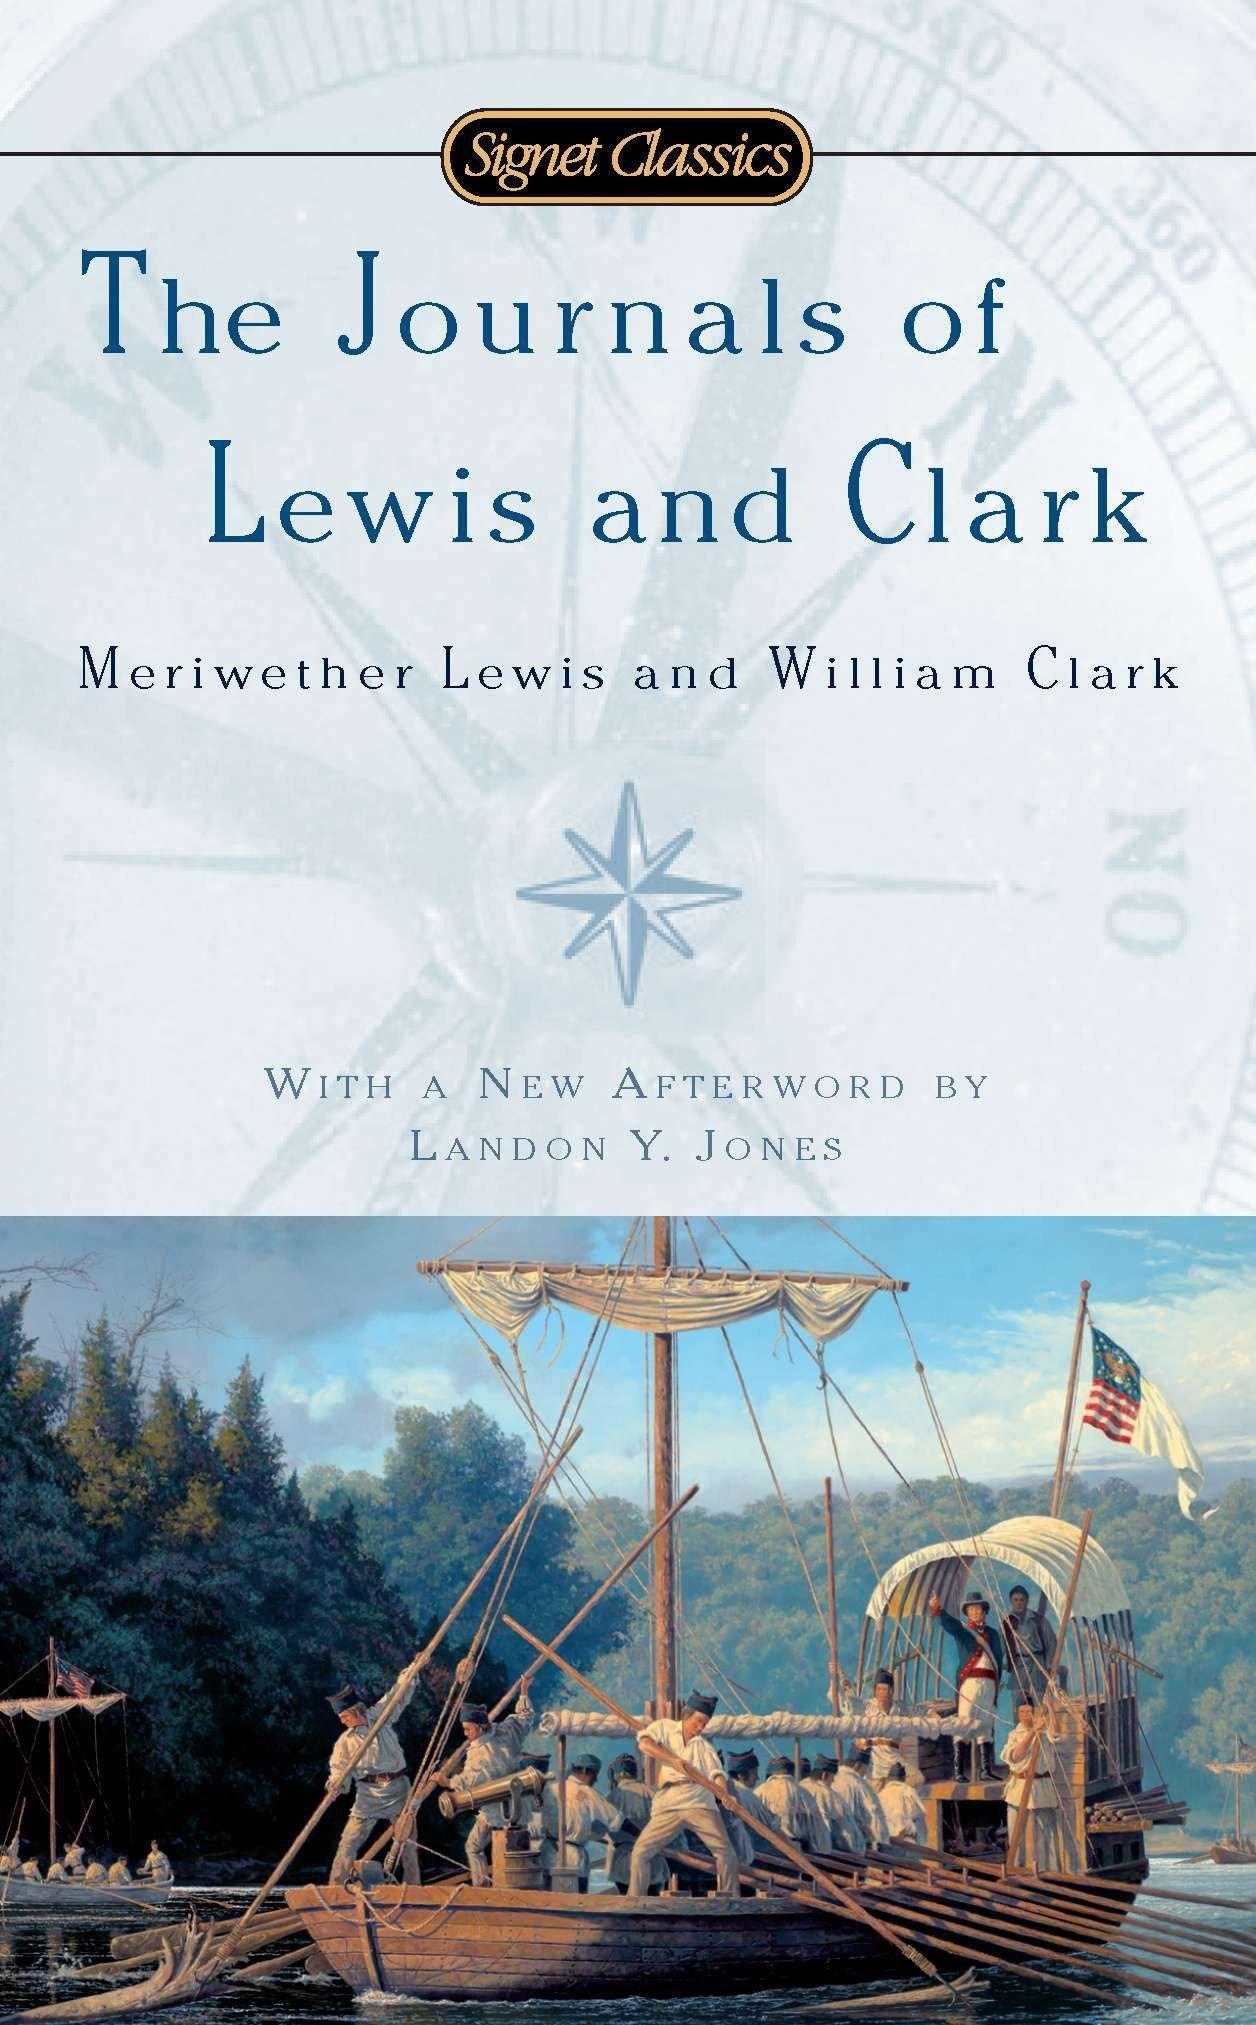 The Journals of Lewis and Clark (Signet Classics): John Bakeless, Landon Y.  Jones: 9780451531889: Amazon.com: Books